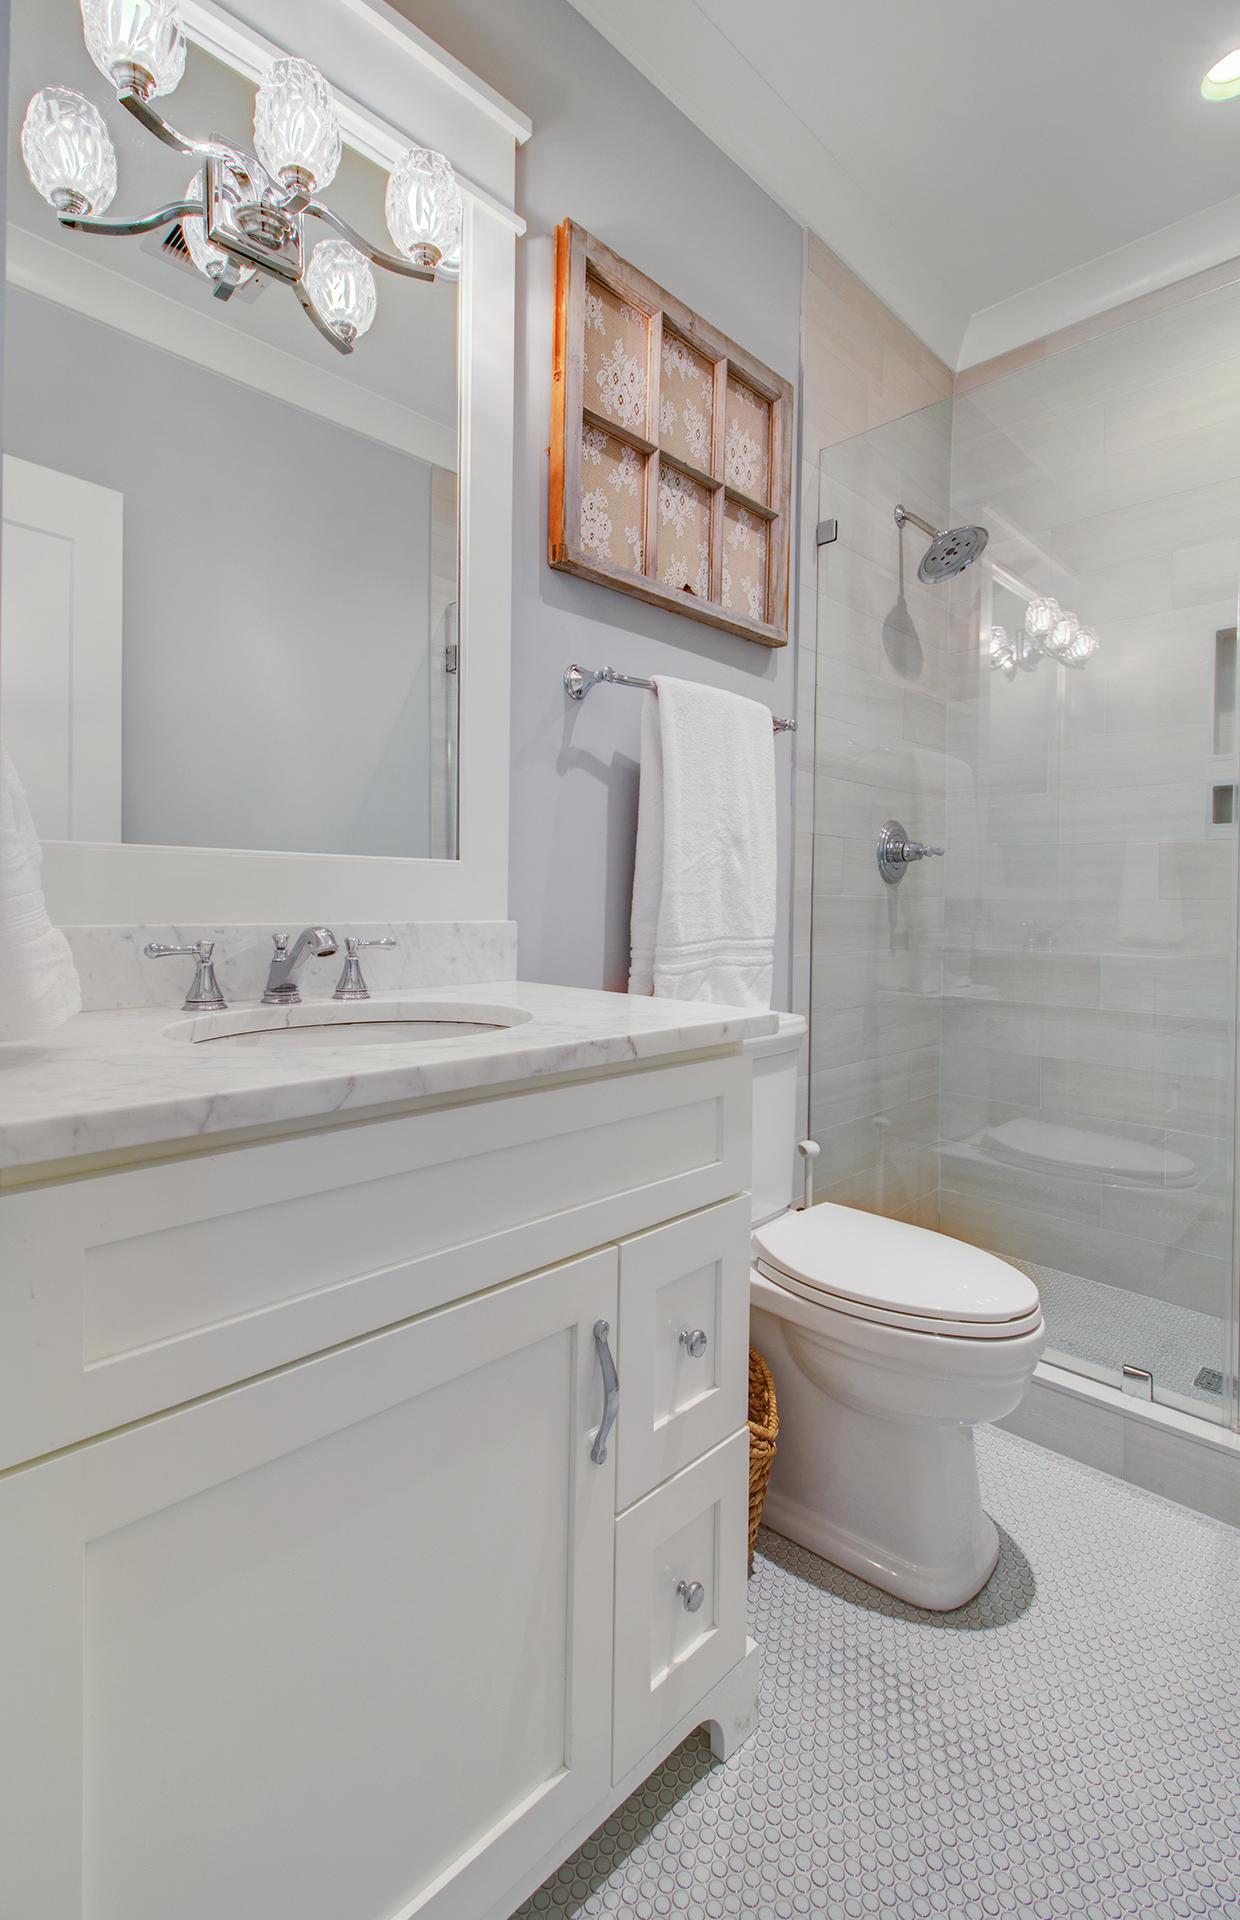 Daniel Island Park Homes For Sale - 117 Brailsford, Charleston, SC - 64